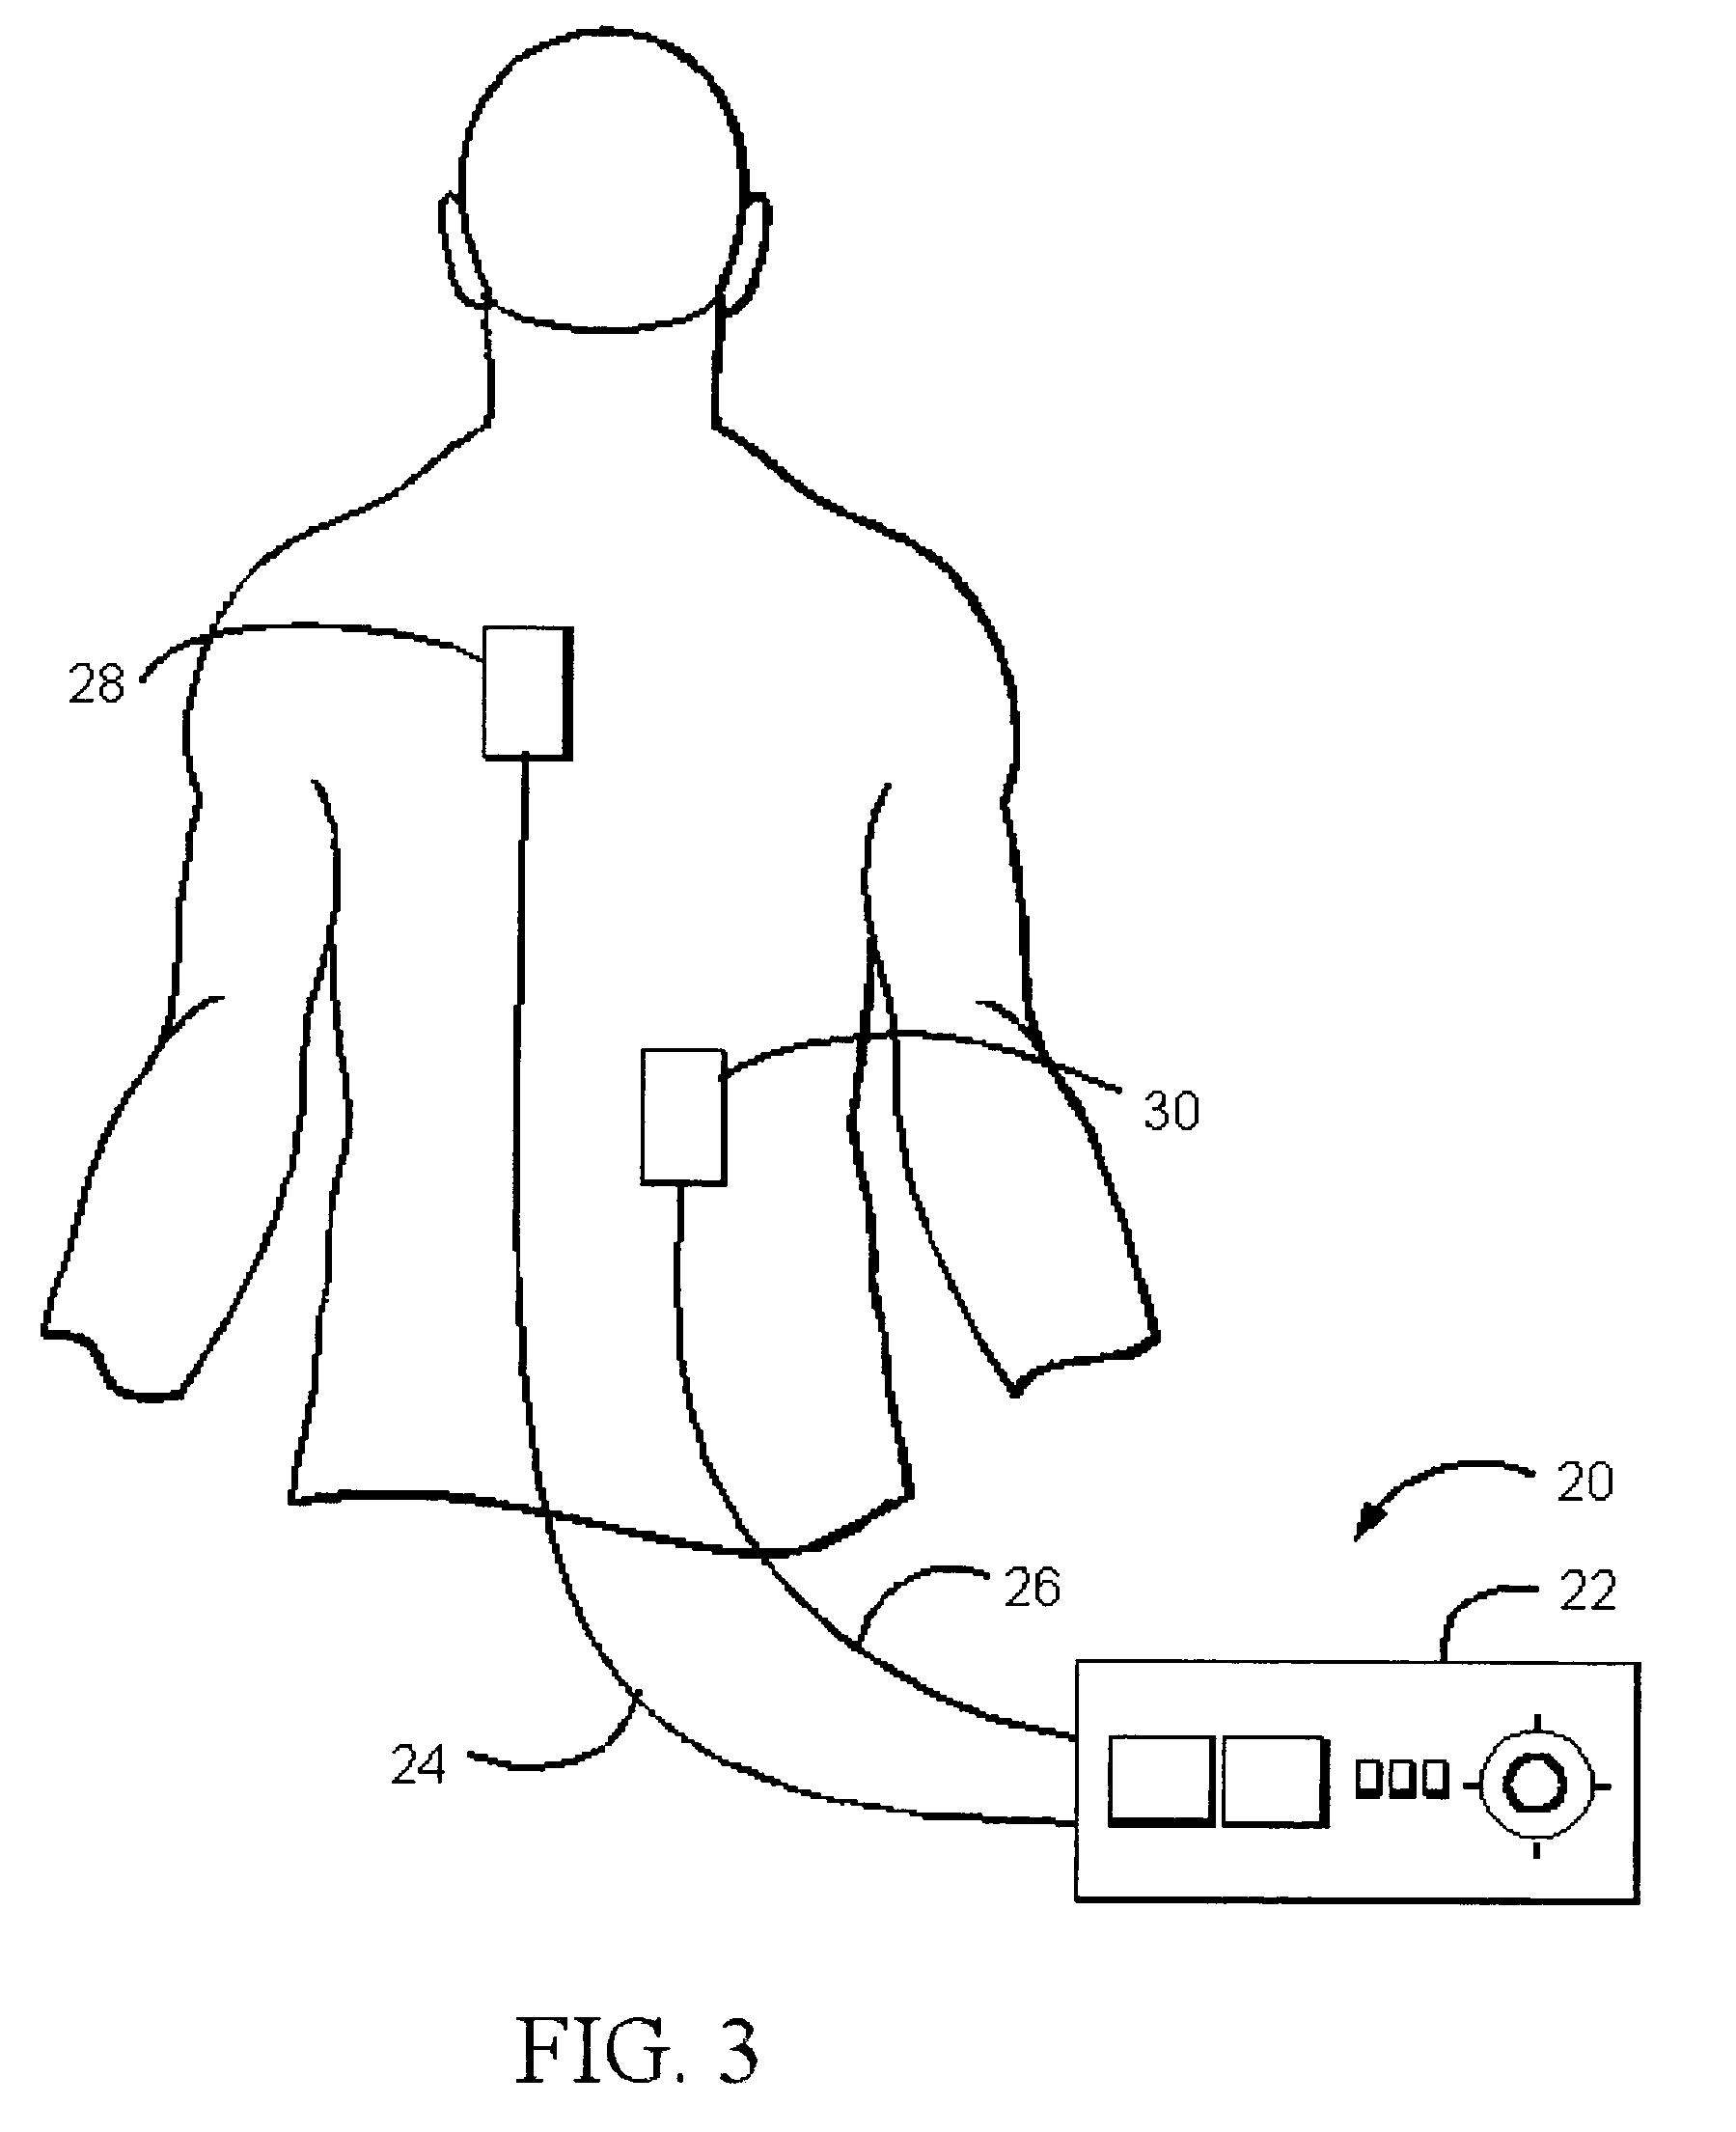 transcutaneous electrical nerve stimulator